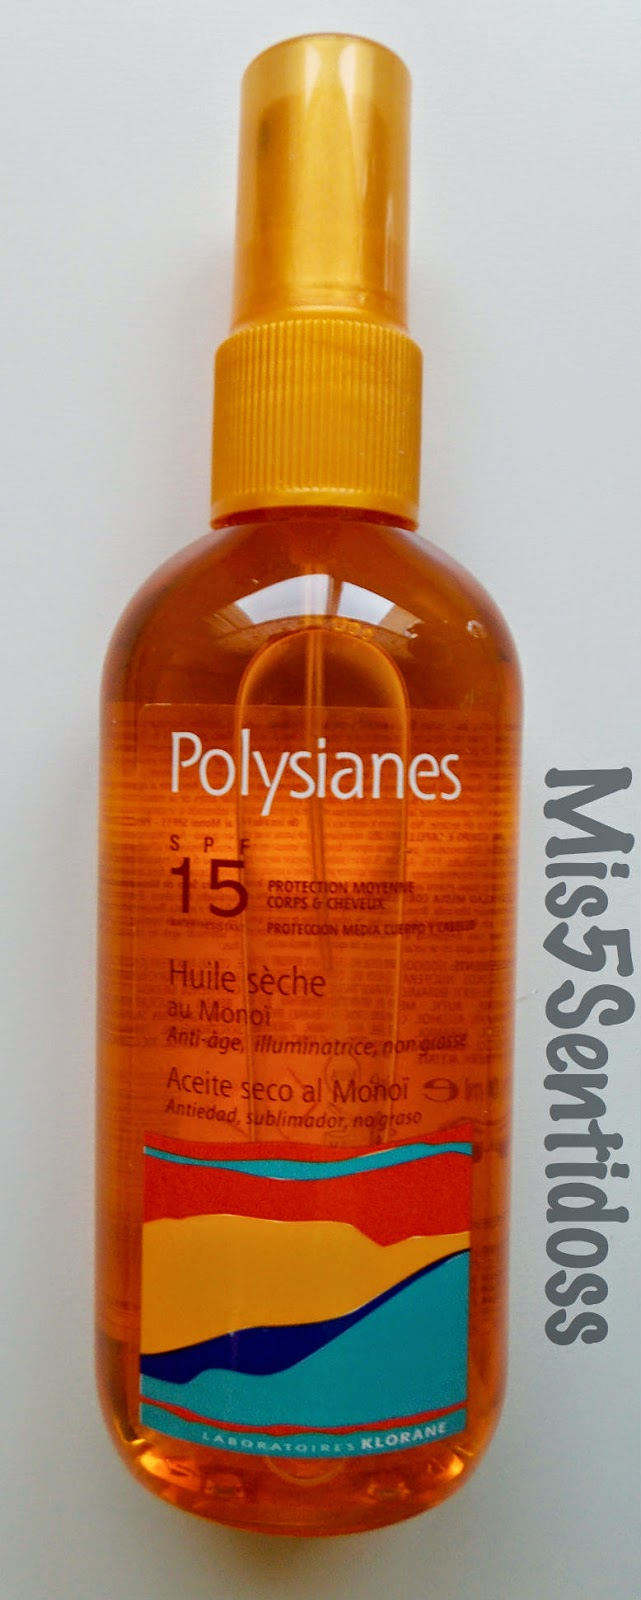 Polysianes Aceite seco